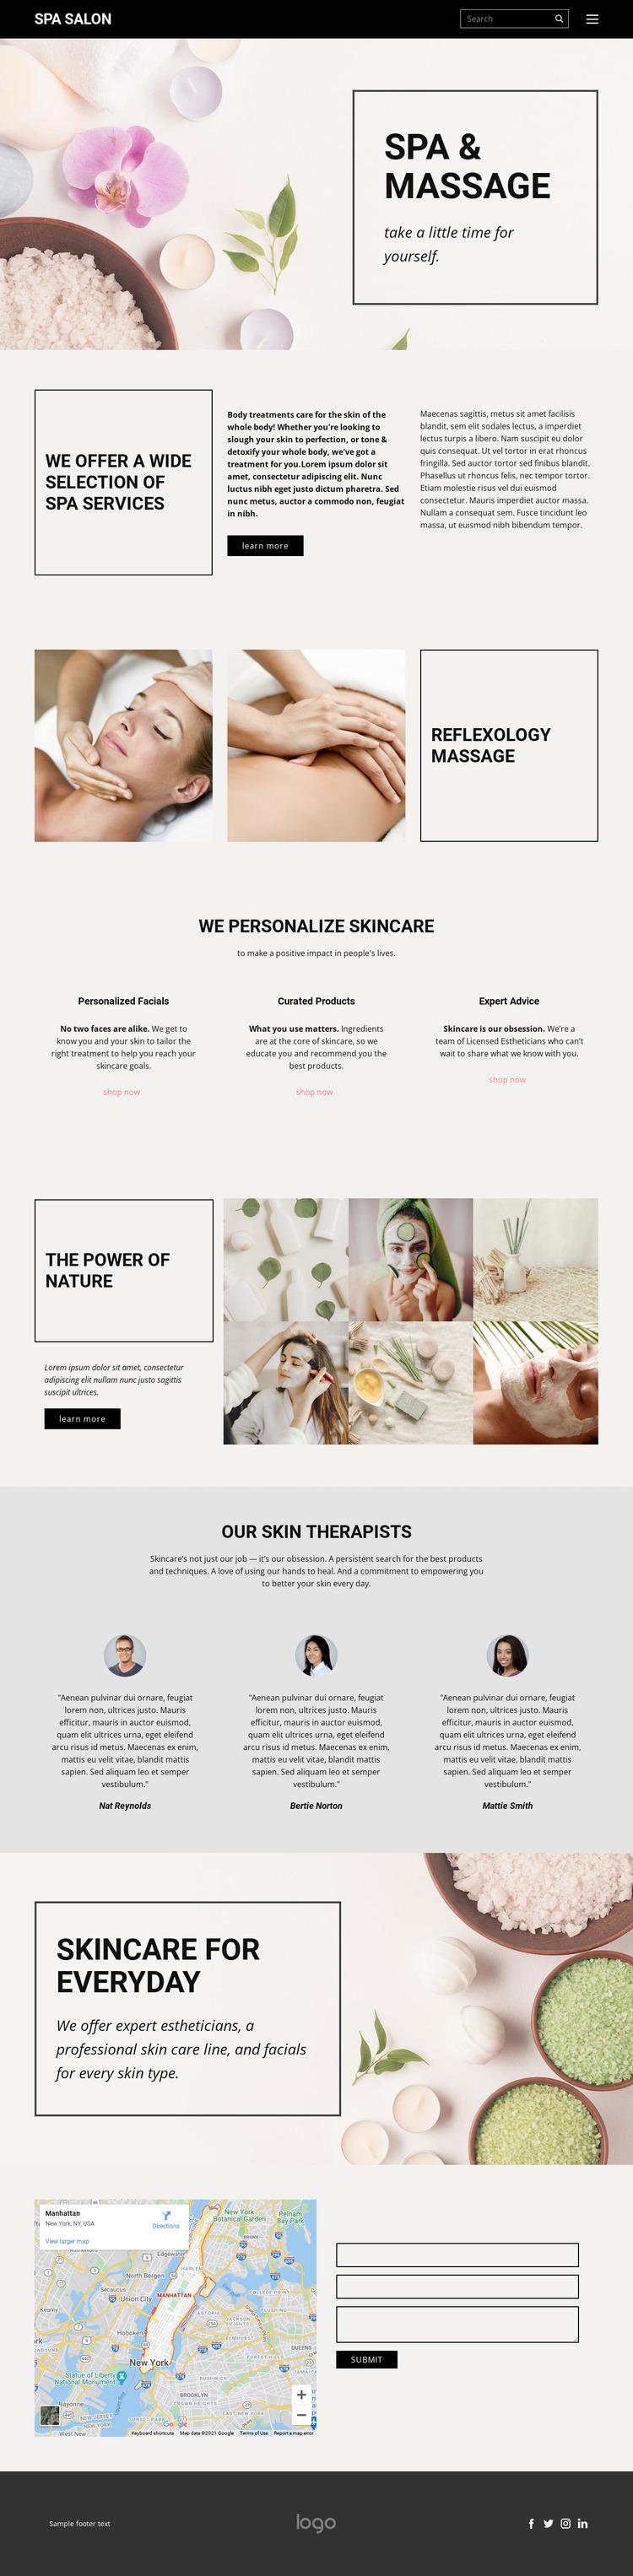 SPA and massage Website Mockup